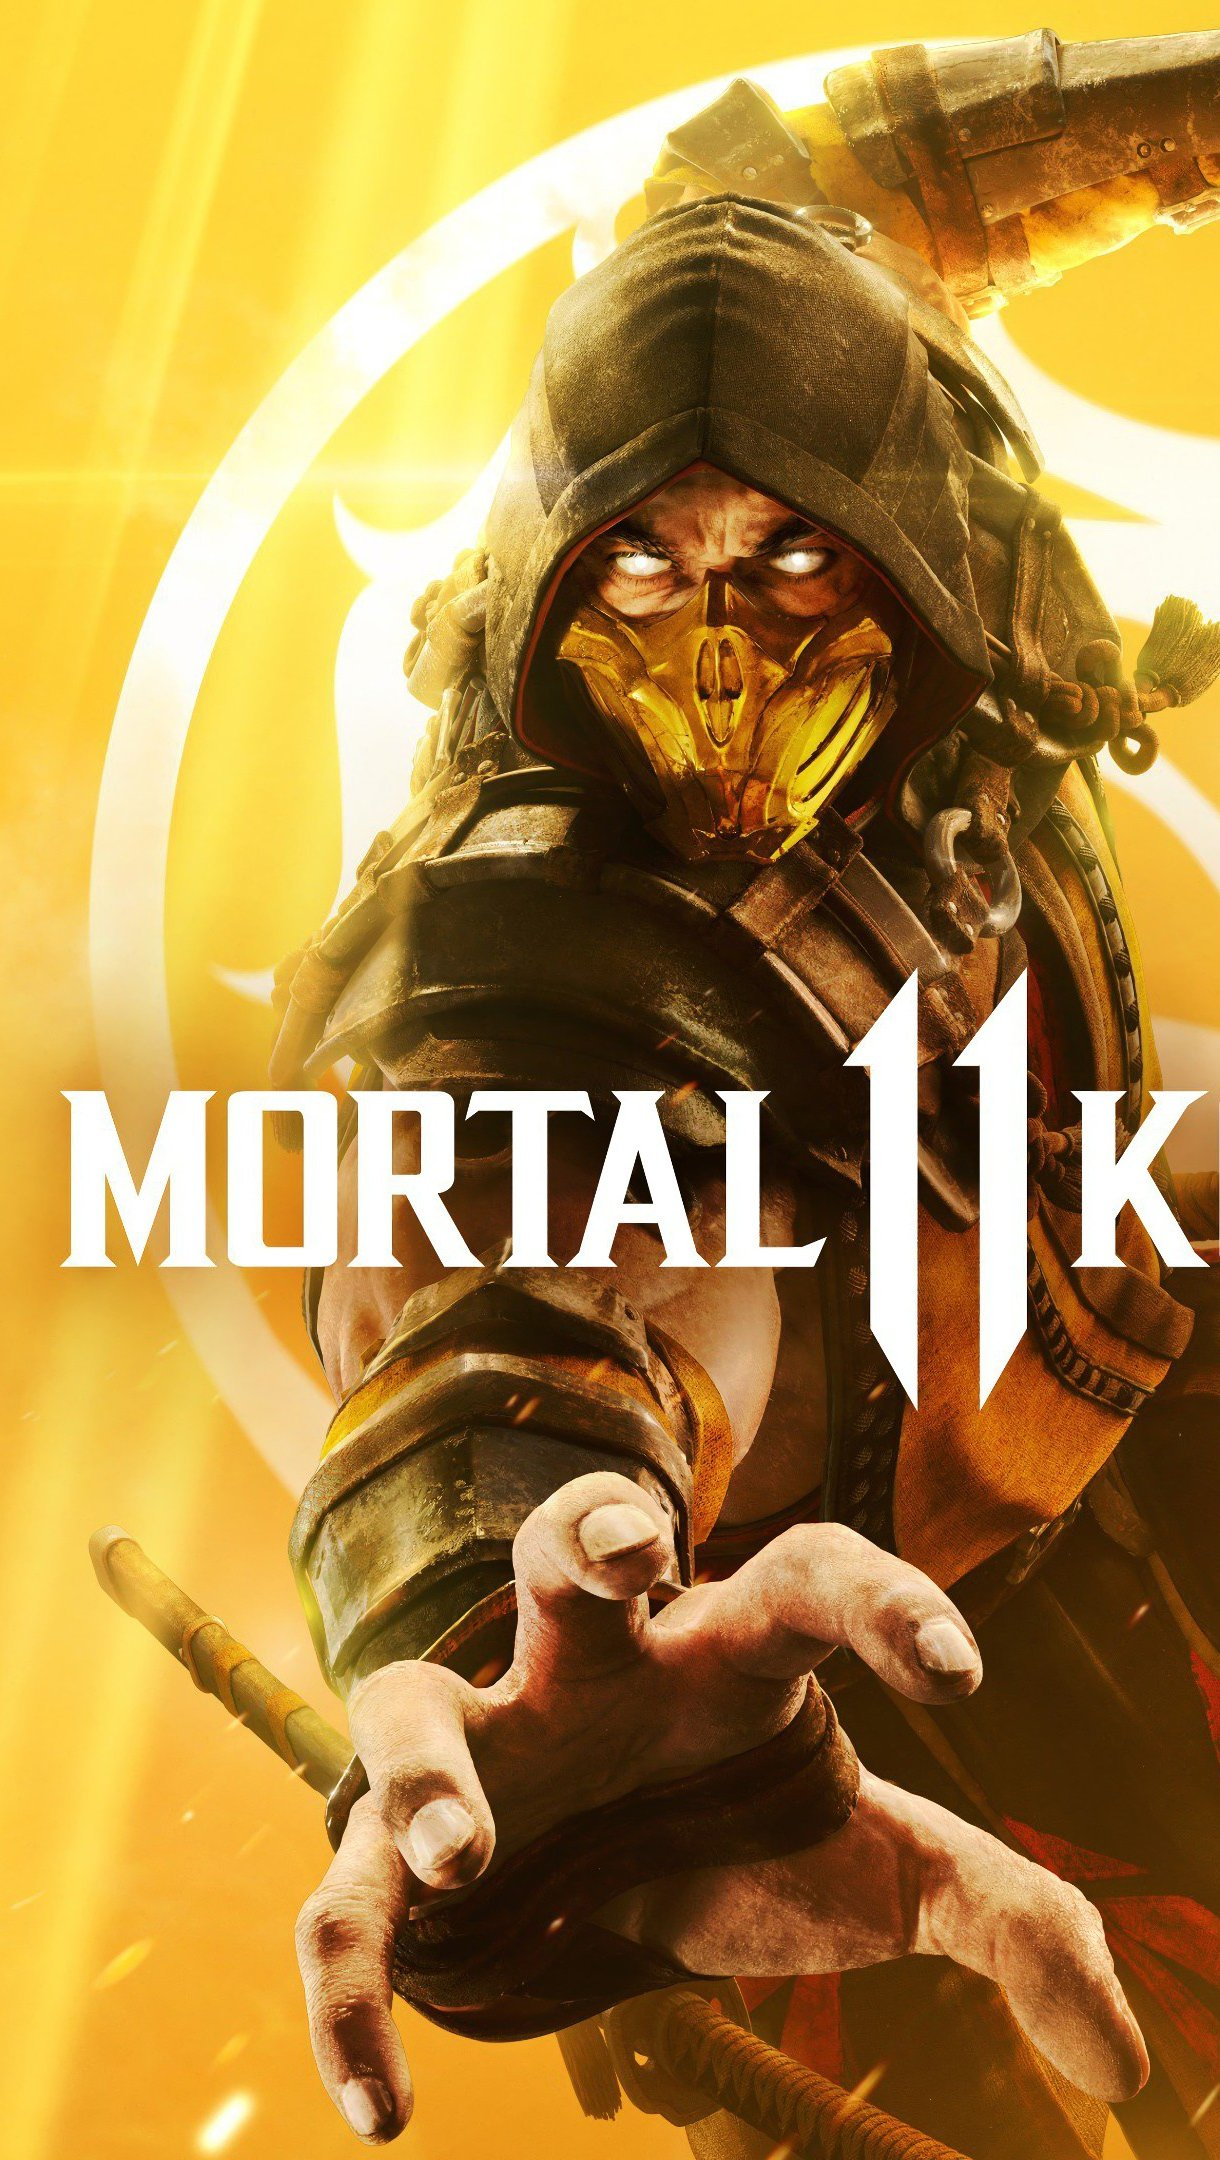 Fondos de pantalla Mortal Kombat 11 Scorpion Vertical